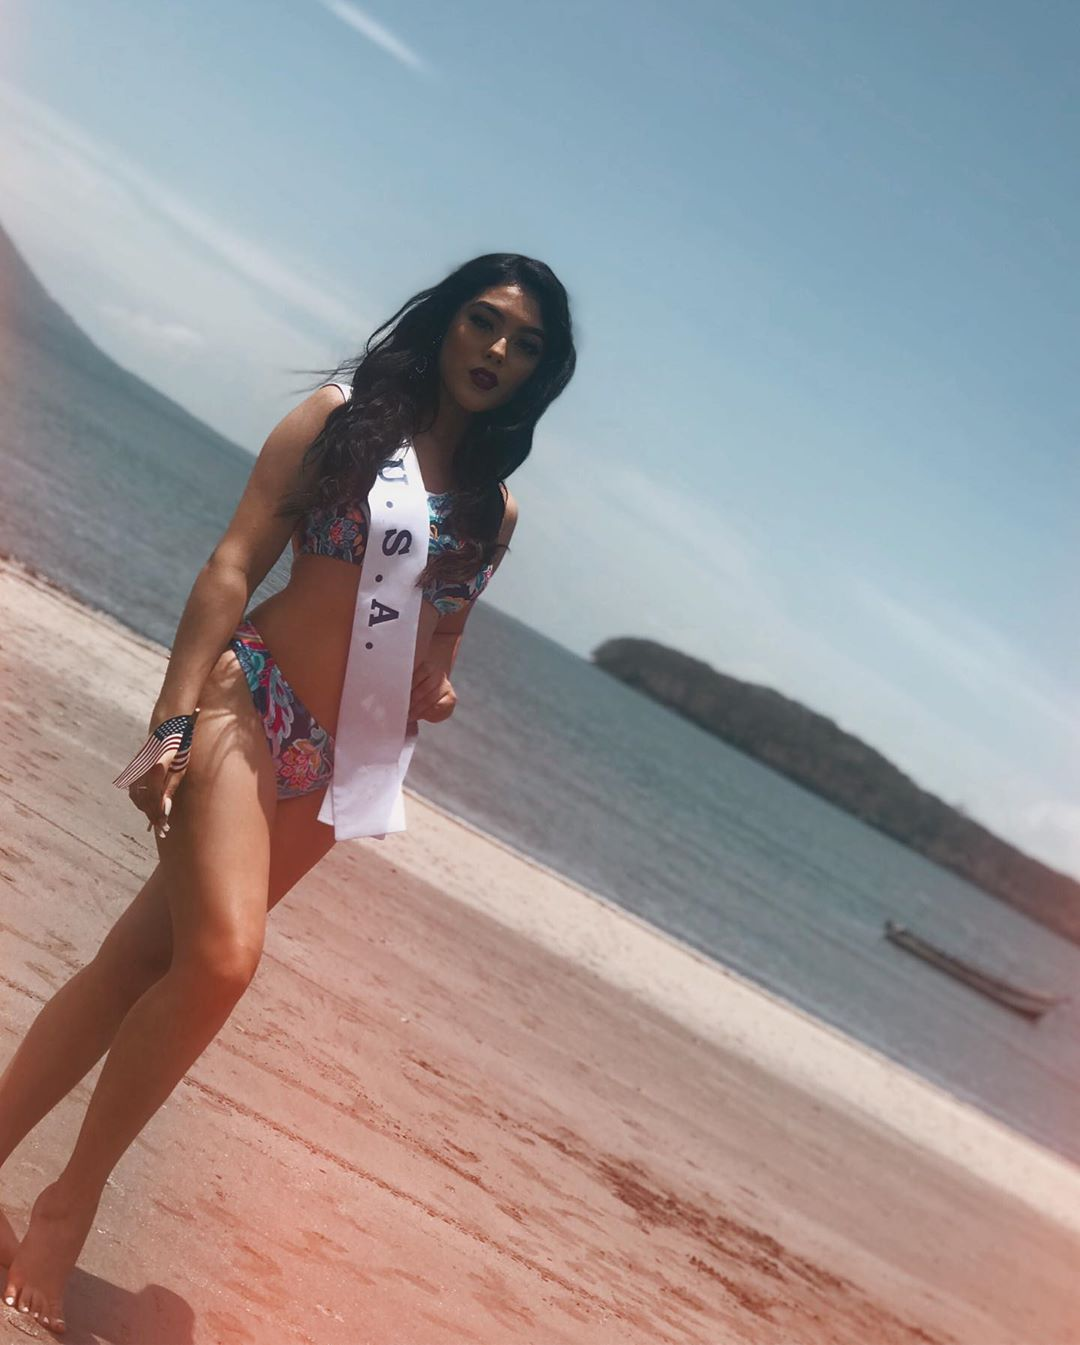 kristian de leon, miss teen mundial usa 2019/top 16 de teen universe 2018. - Página 4 59353310